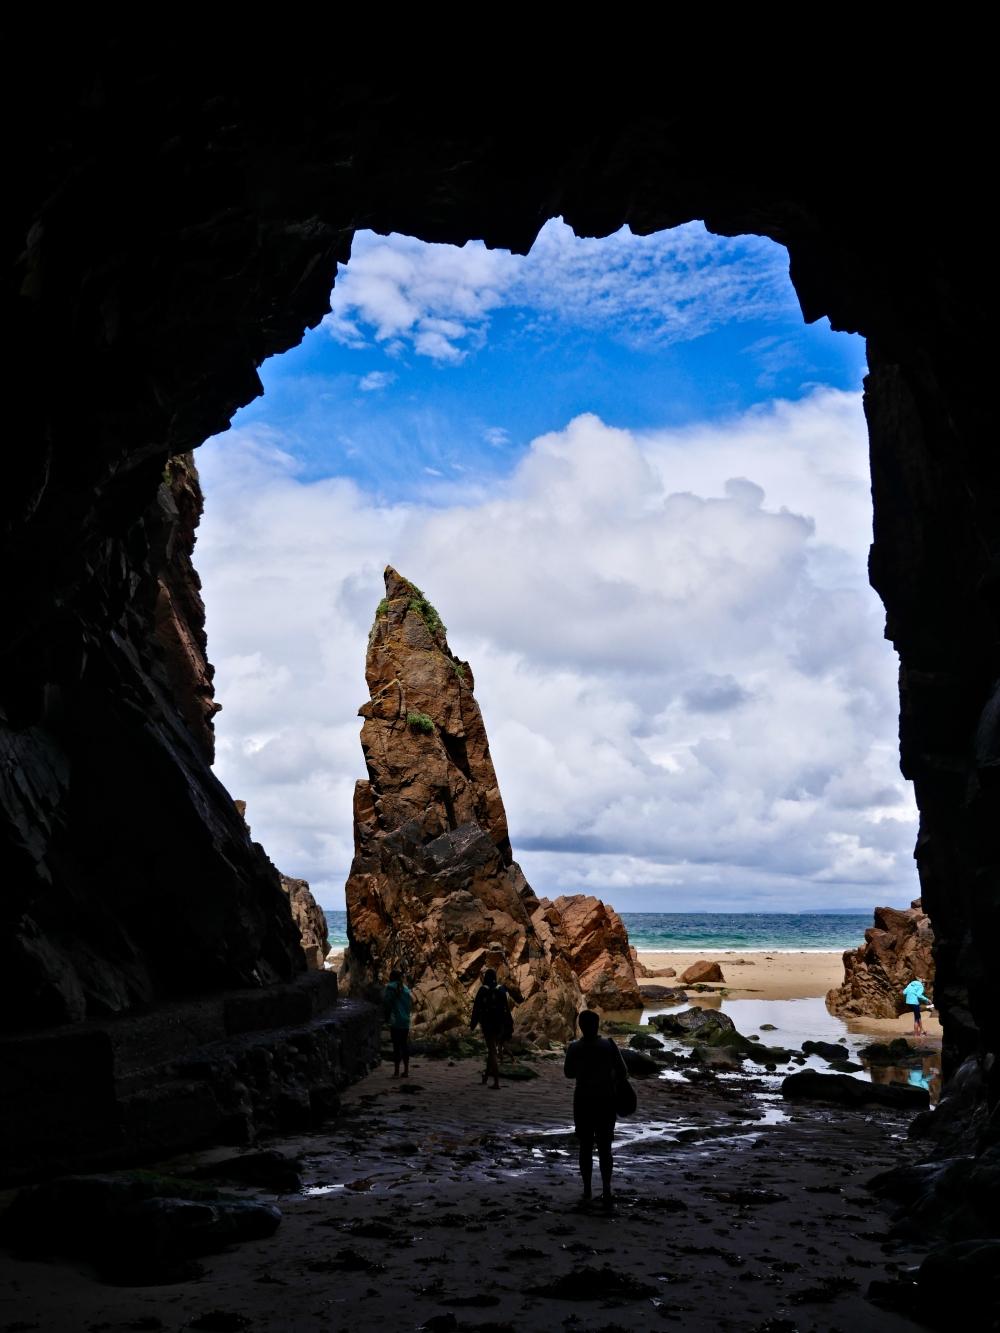 Large cave at St Plemont Bay